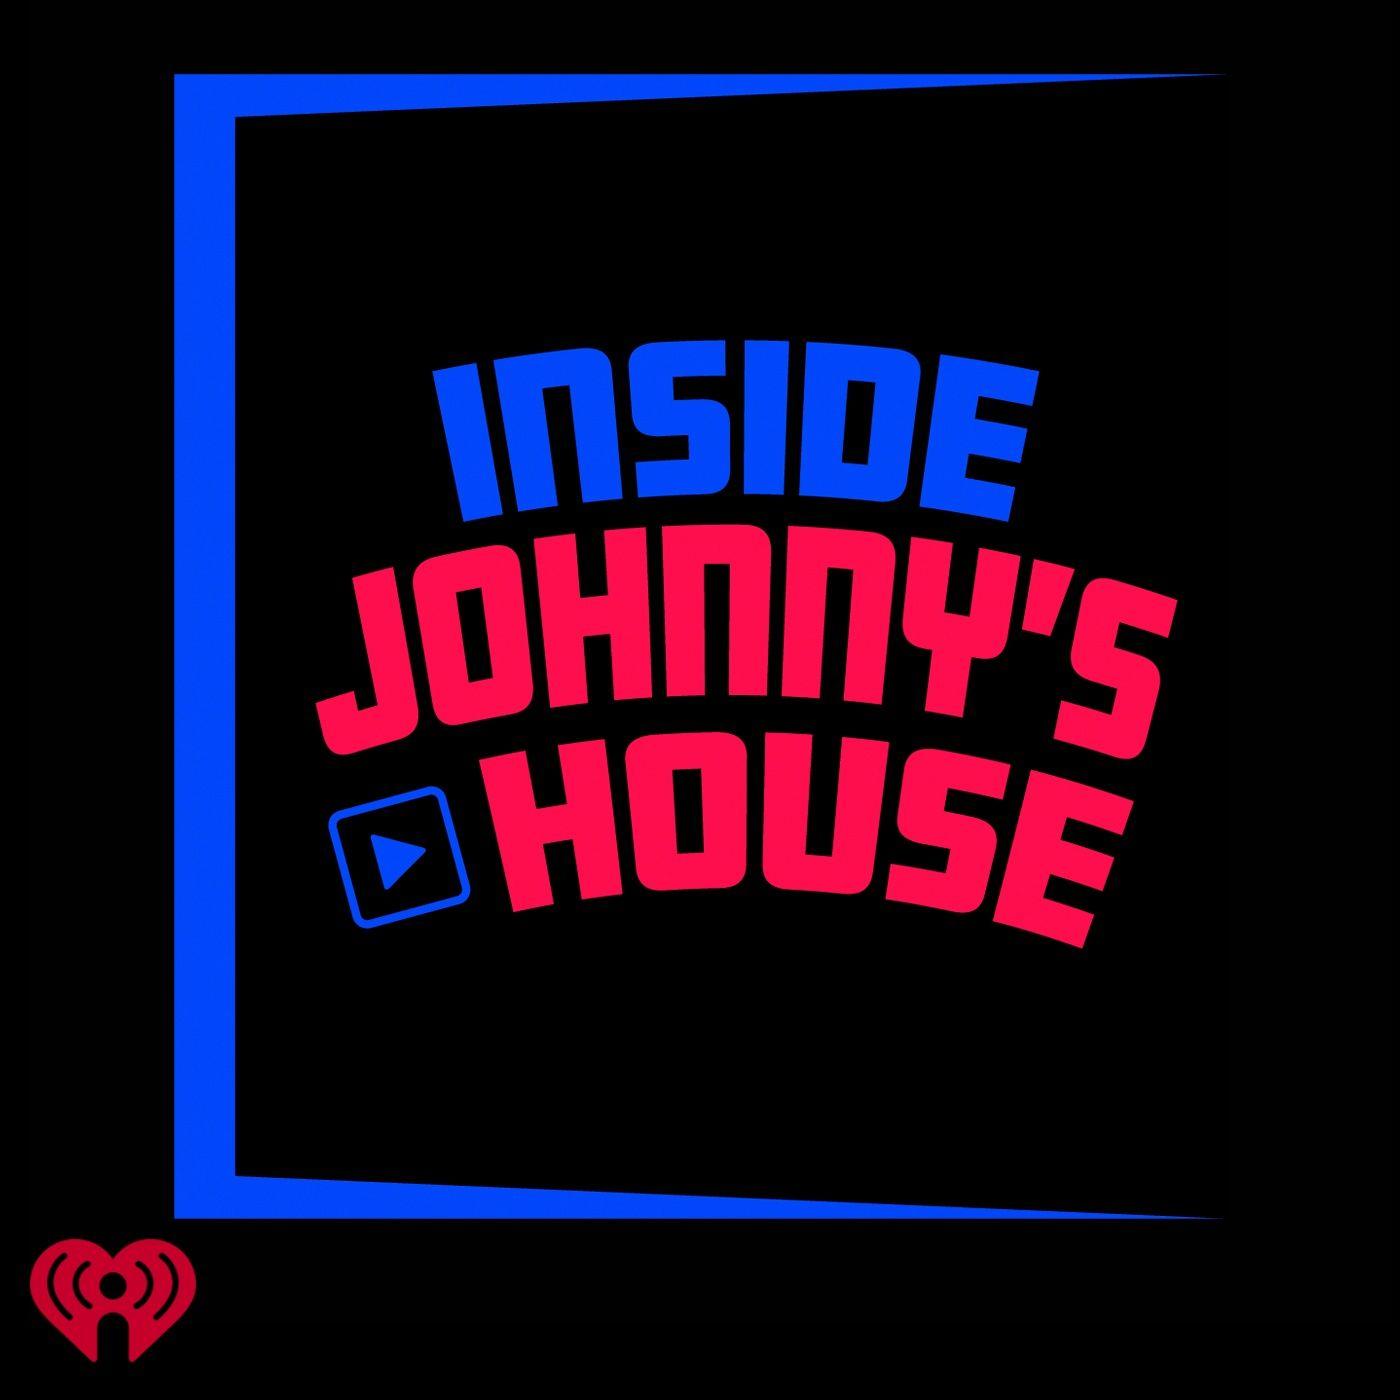 Inside Johnny's House: Christmas